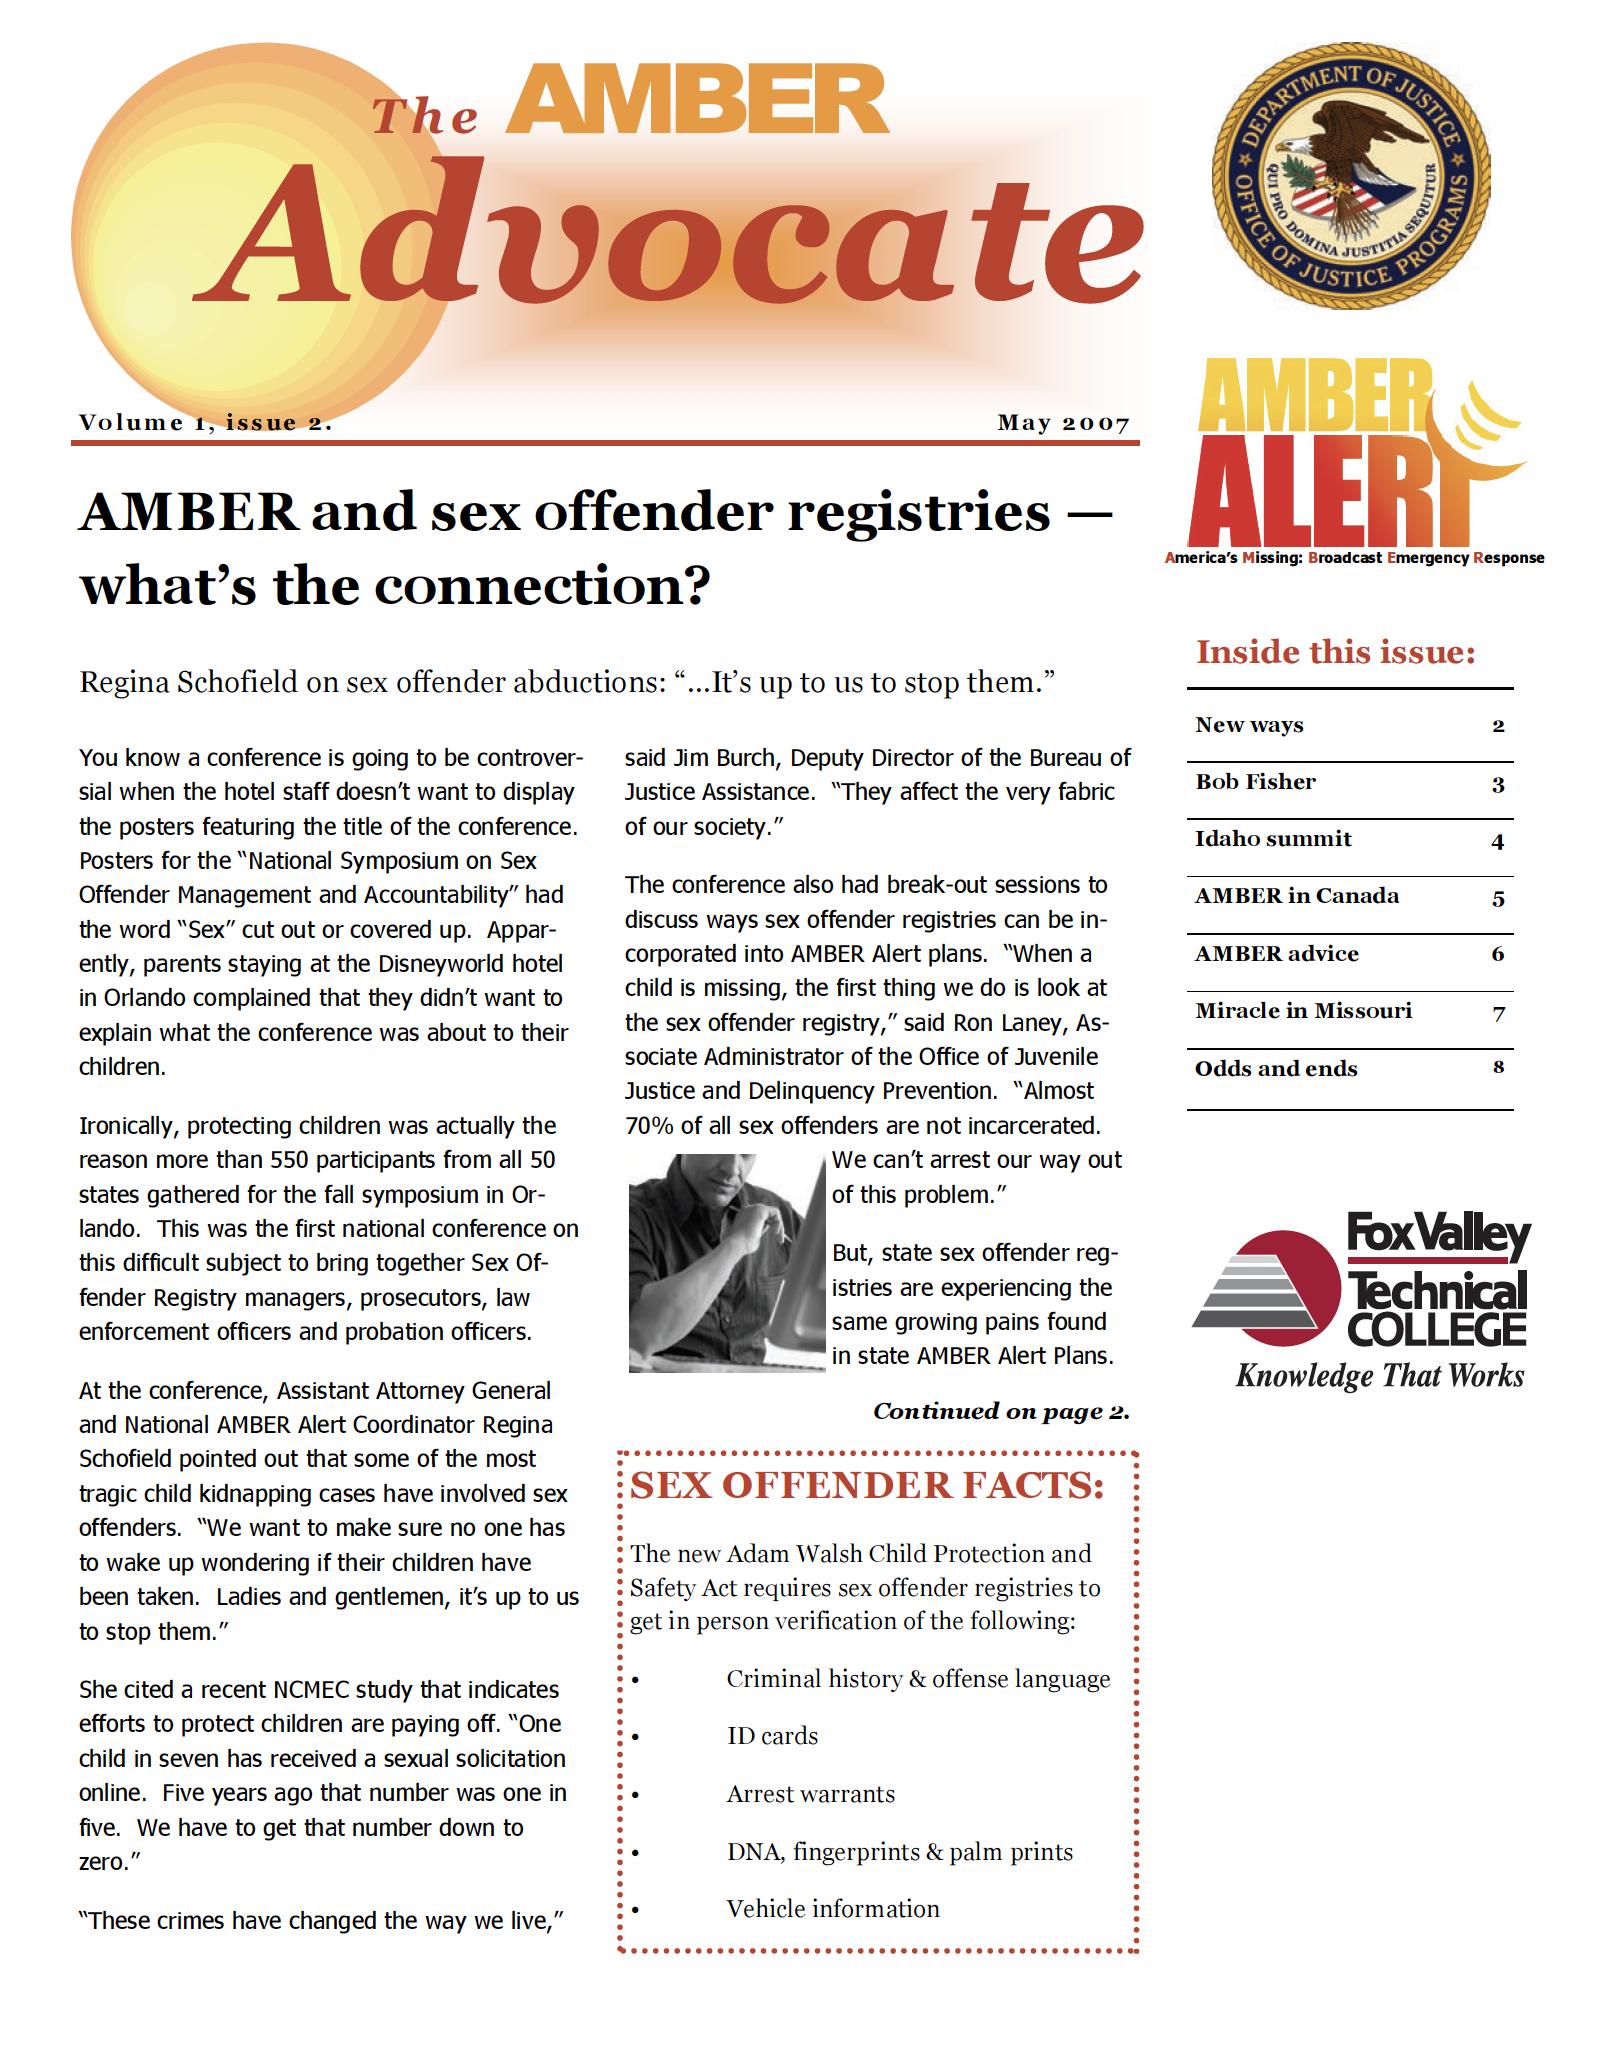 AMBER Advocate 2 cover